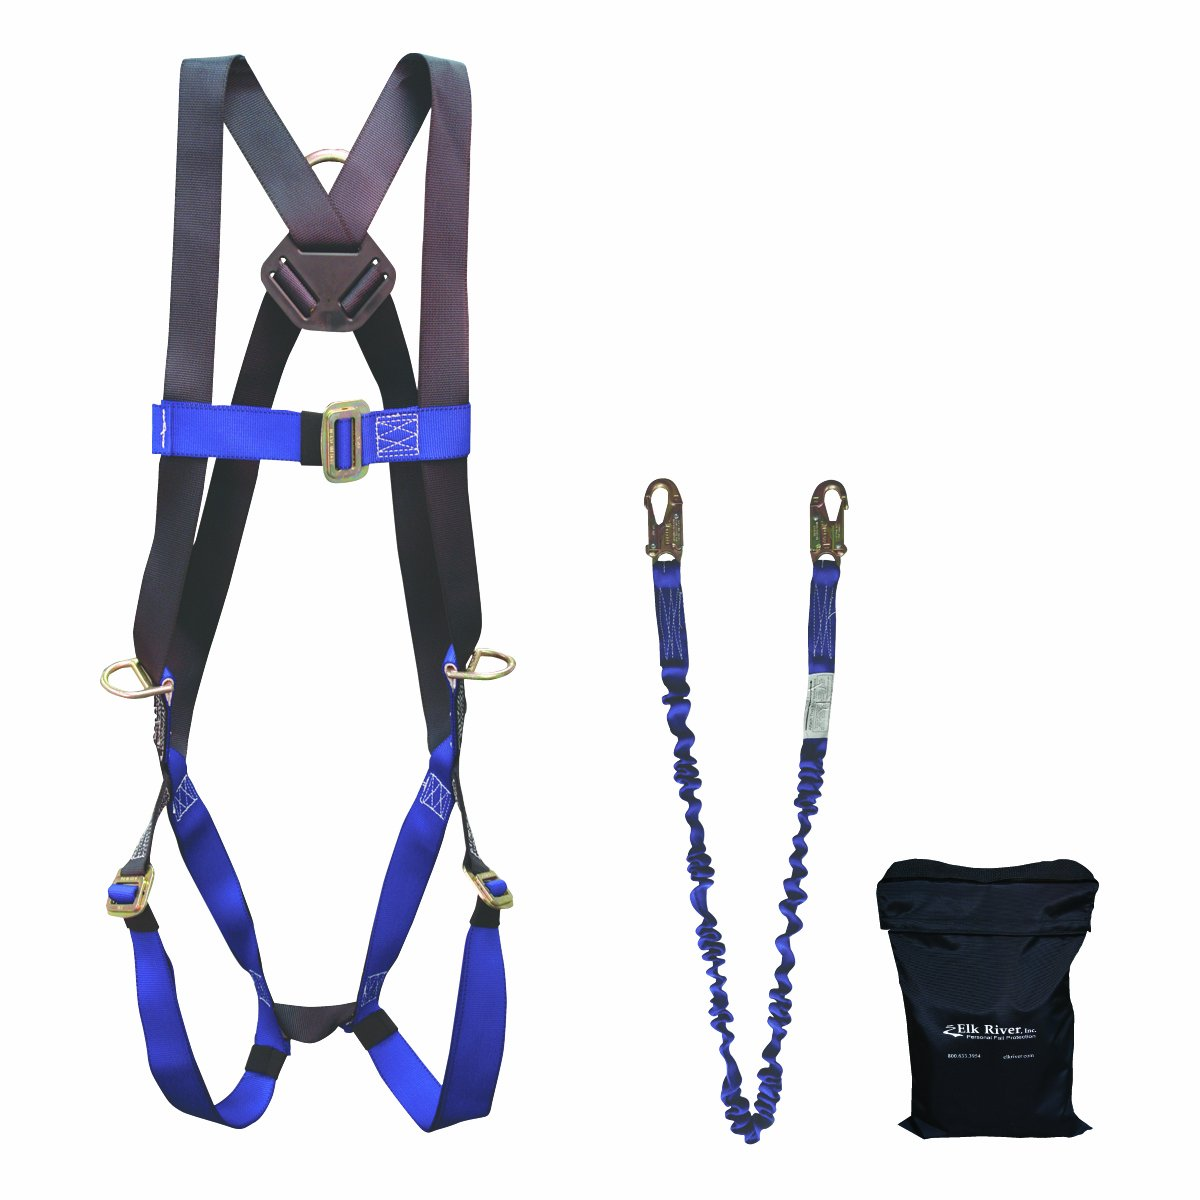 Elk River 05503 Fall Protection Kit